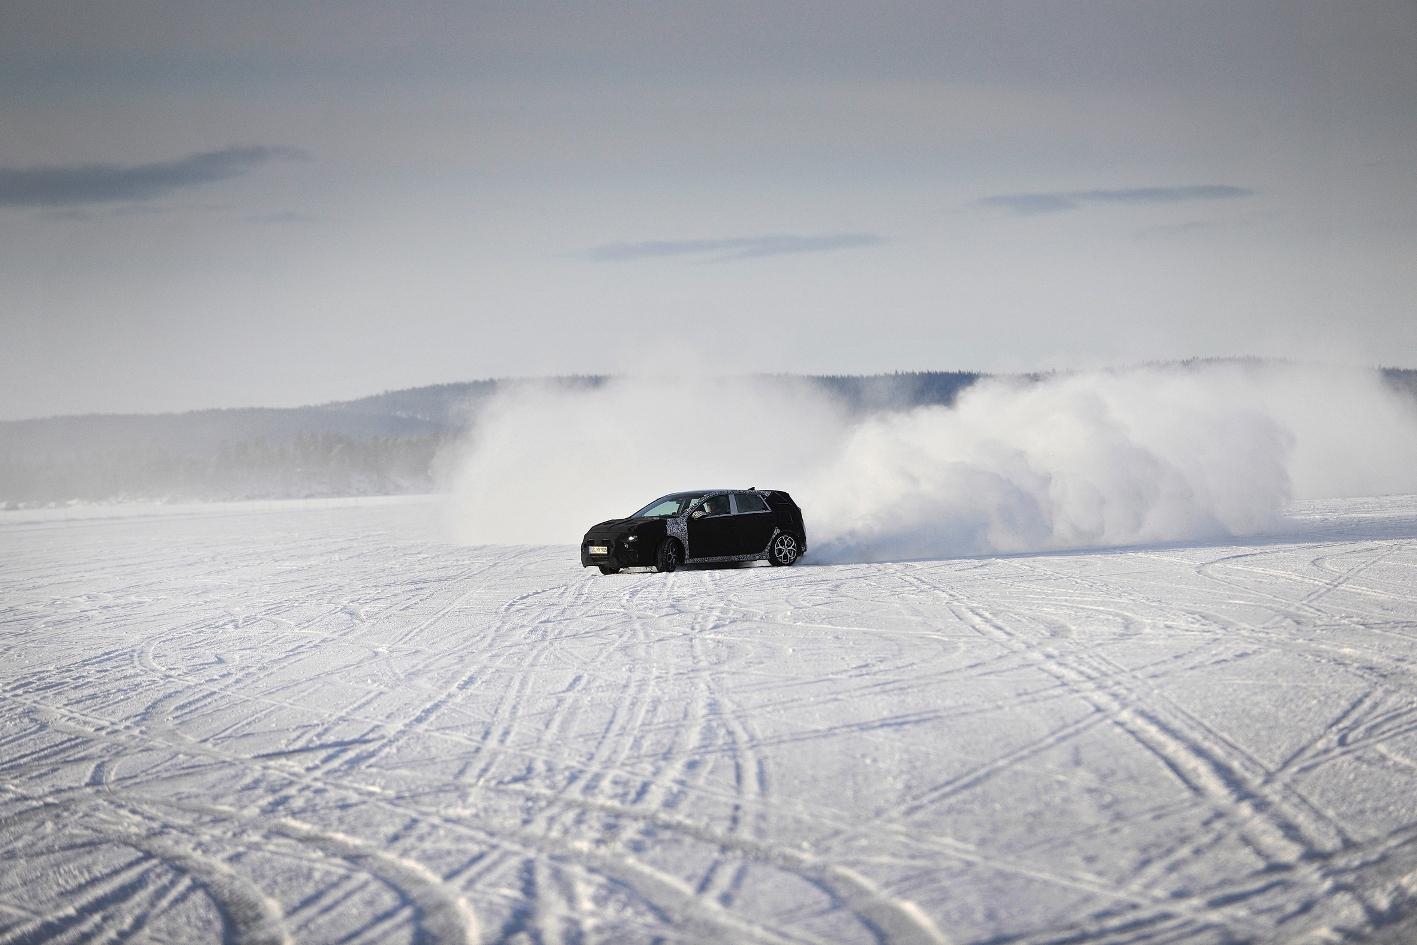 Hyundai2Bi302BN2BWinter2BTesting2BSweden 3 Δες τις δοκιμές του Hyundai i30Ν σε μια παγωμένη λίμνη Hyundai, Hyundai i30, hyundai i30n, Hyundai N, Hyundai Ελλάς, video, videos, zblog, βίντεο